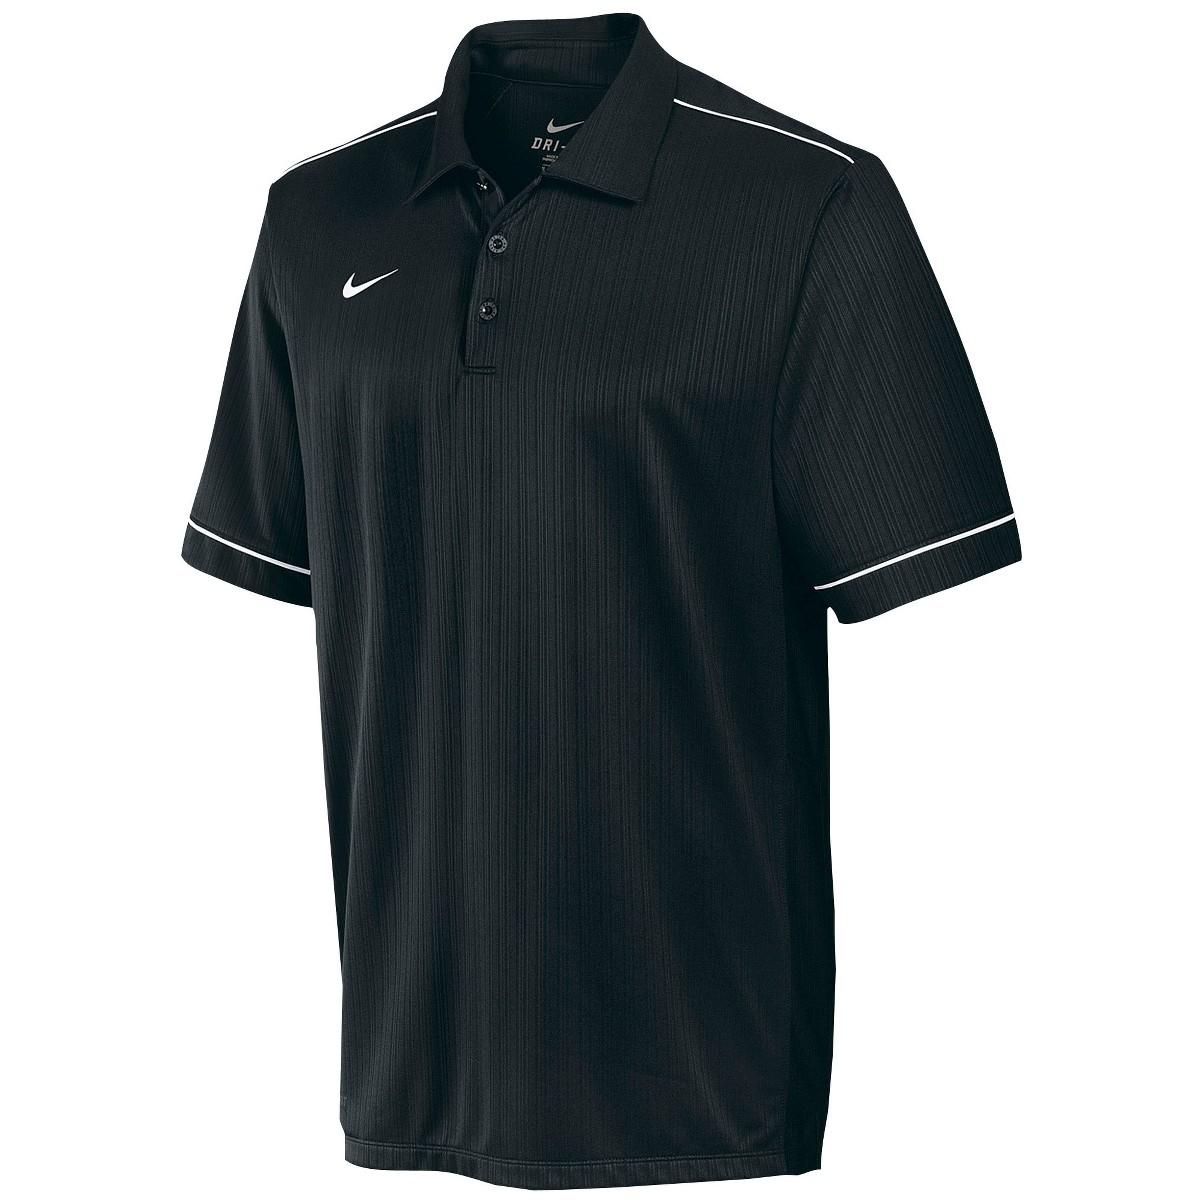 Nike Men's Play Action Pass Dri-Fit Golf Polo Shirt | eBay